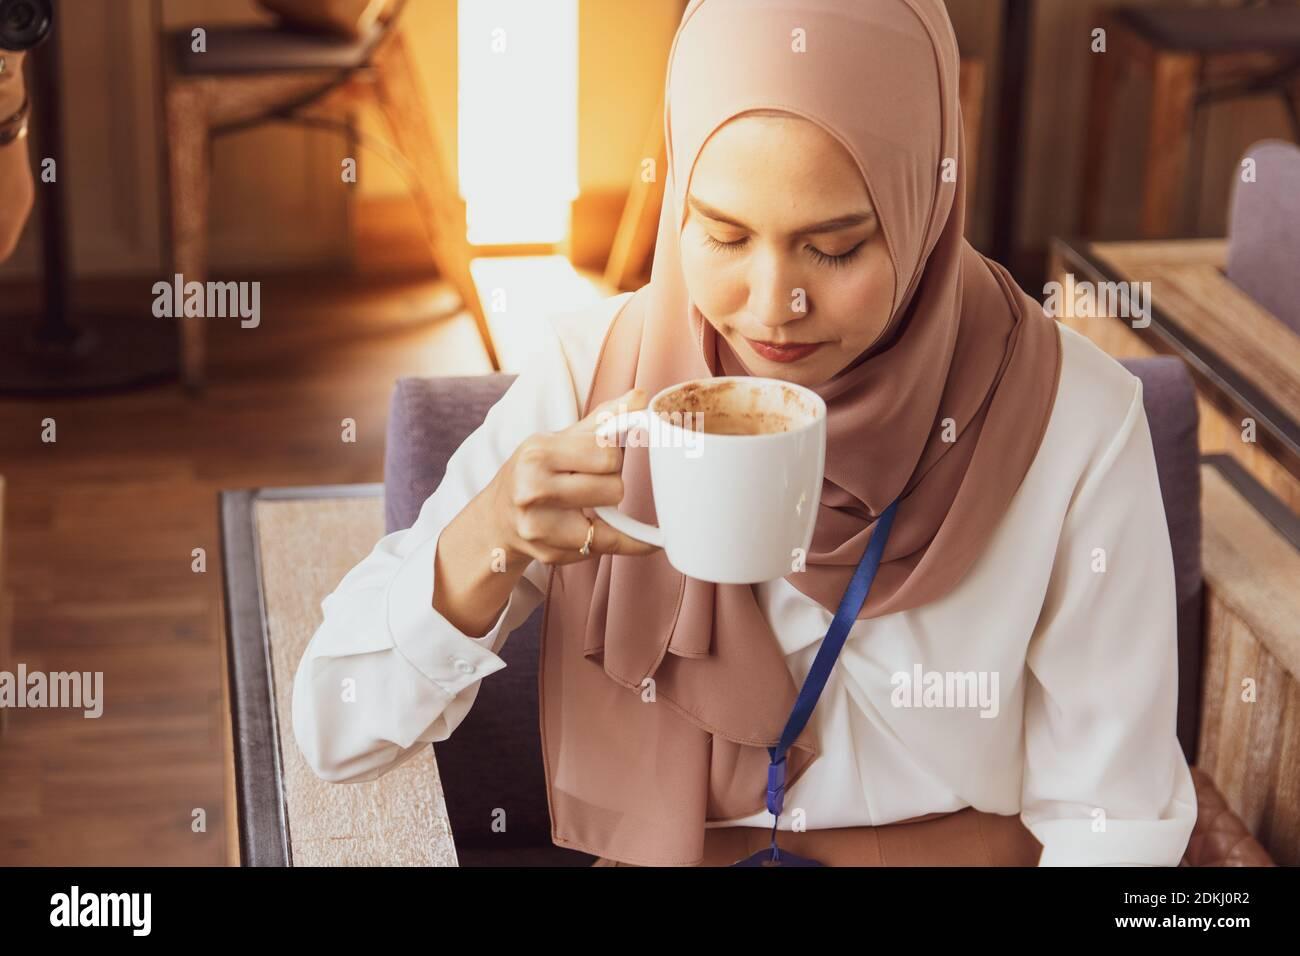 Mia khalifa mengungkapkan dampak keputusannya terjun di industri film porno terhadap kehidupannya di program talk show bbc, hardtalk. Arab Women Drinking Coffee High Resolution Stock Photography And Images Alamy